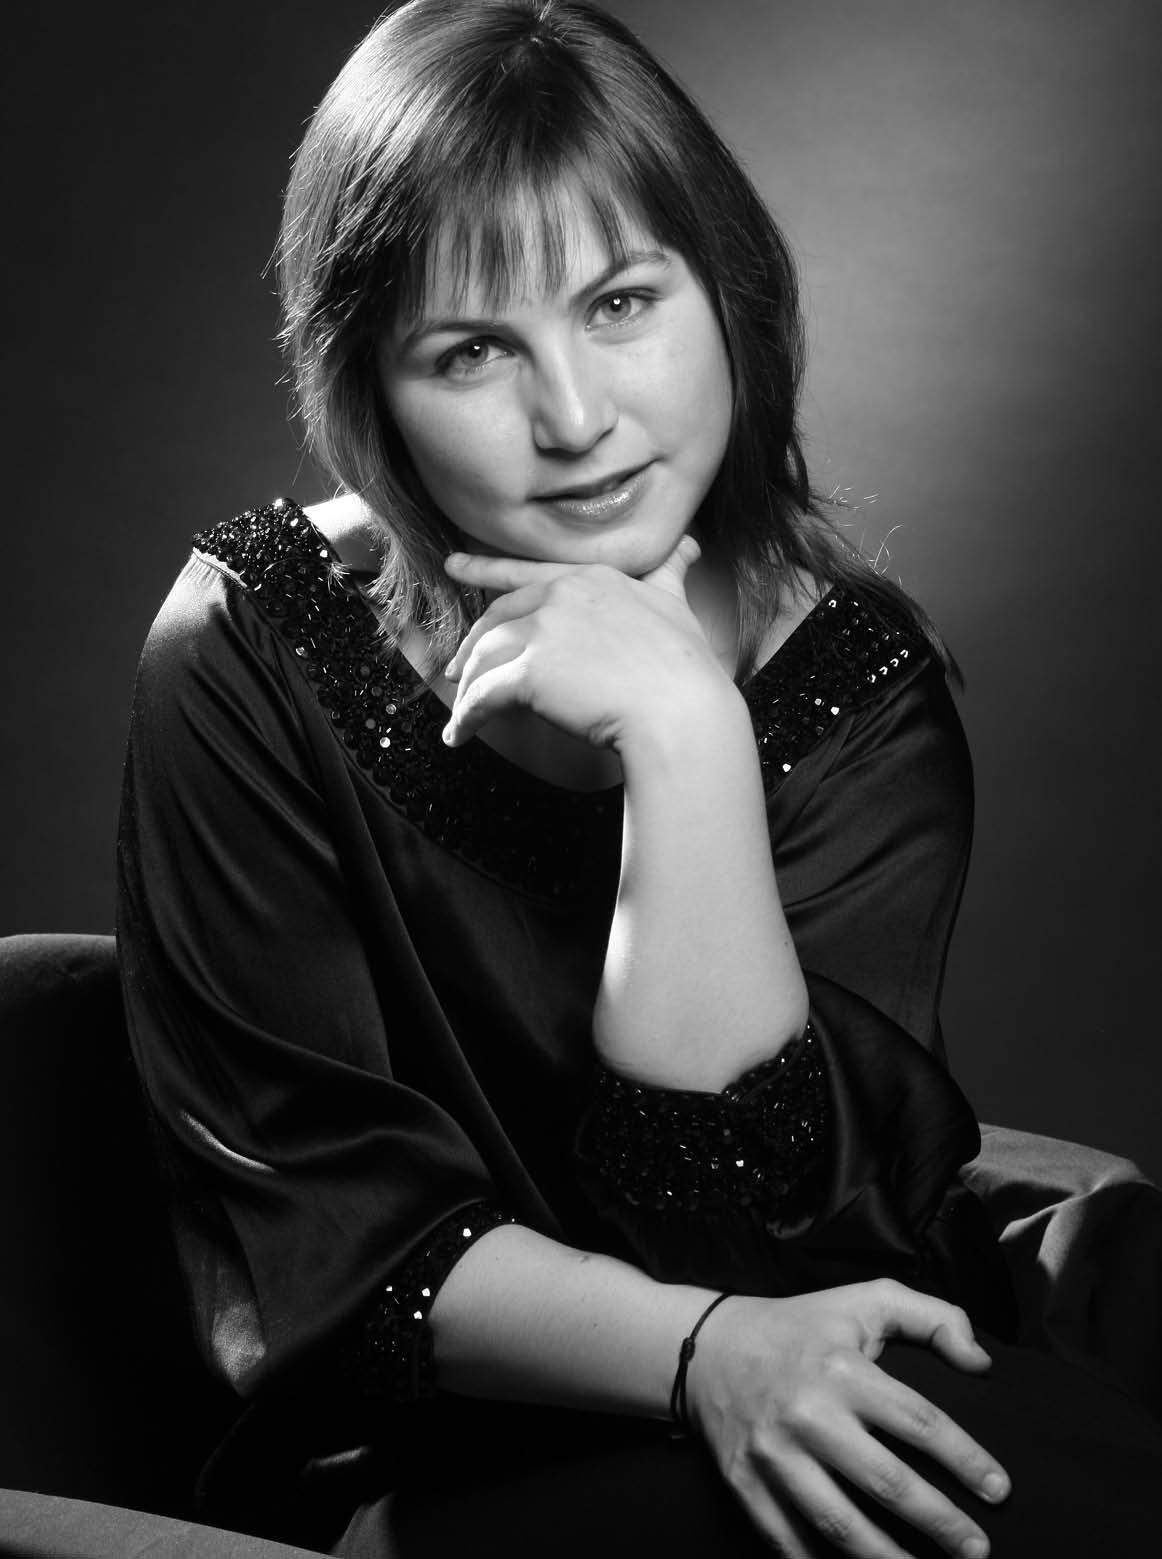 LAURA SIBELLA